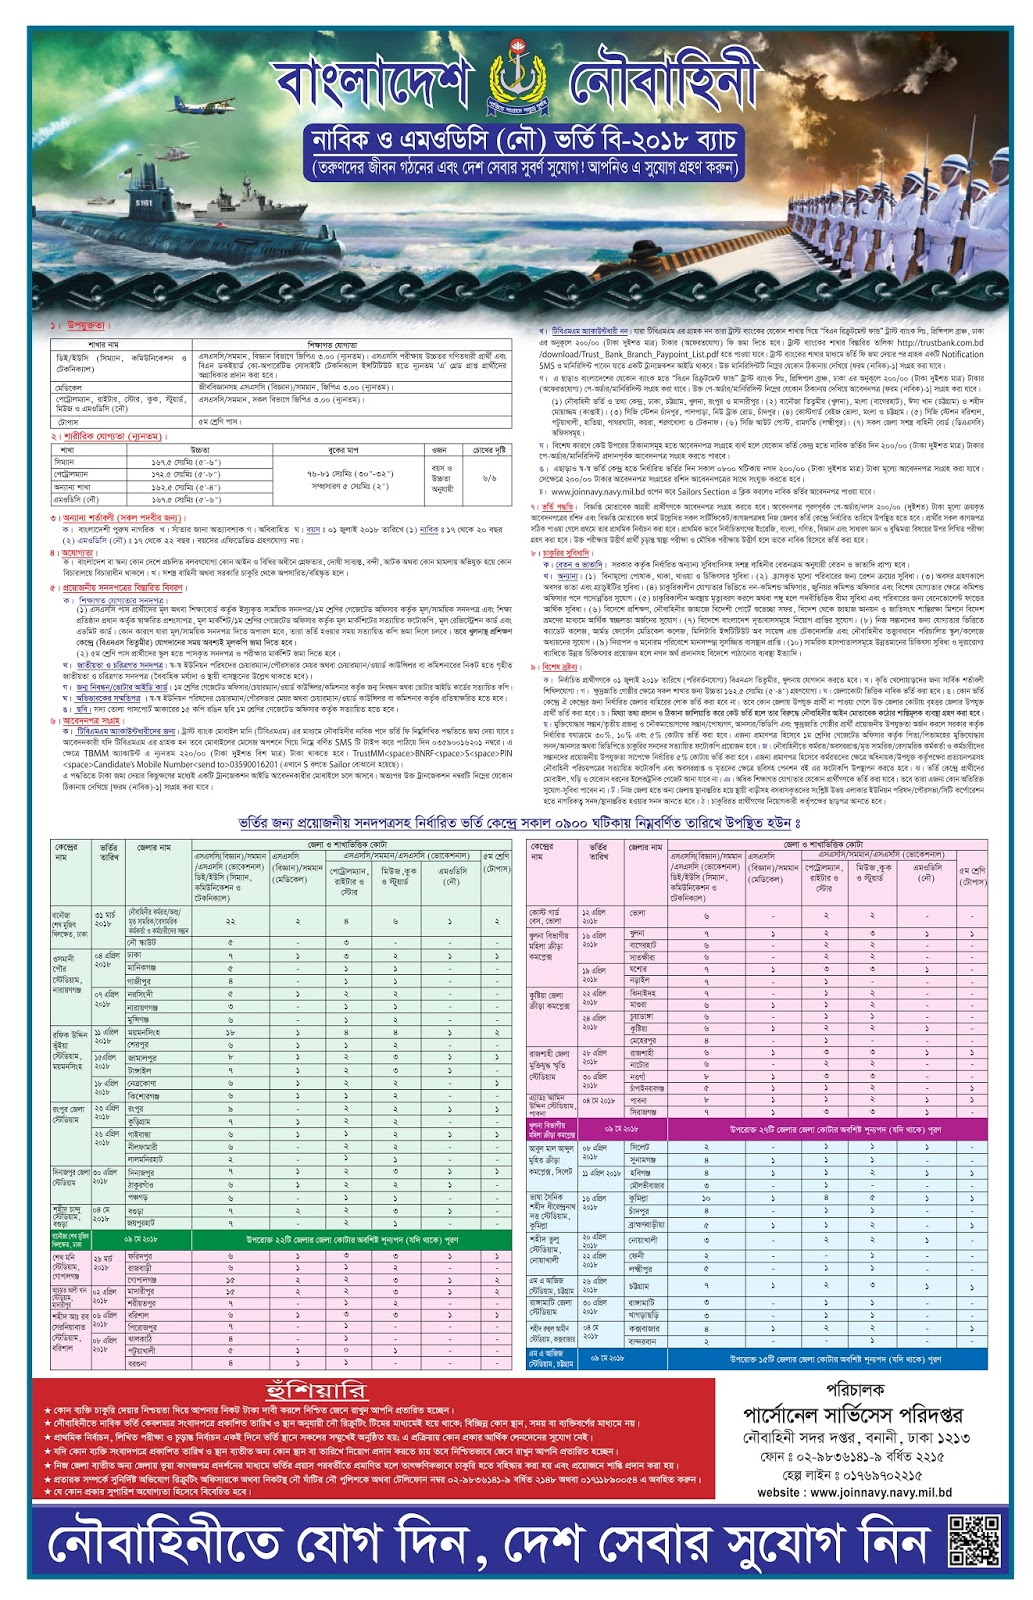 Bangladesh Navy Sailor and MODC(Navy) Recruitment Apply Instruction